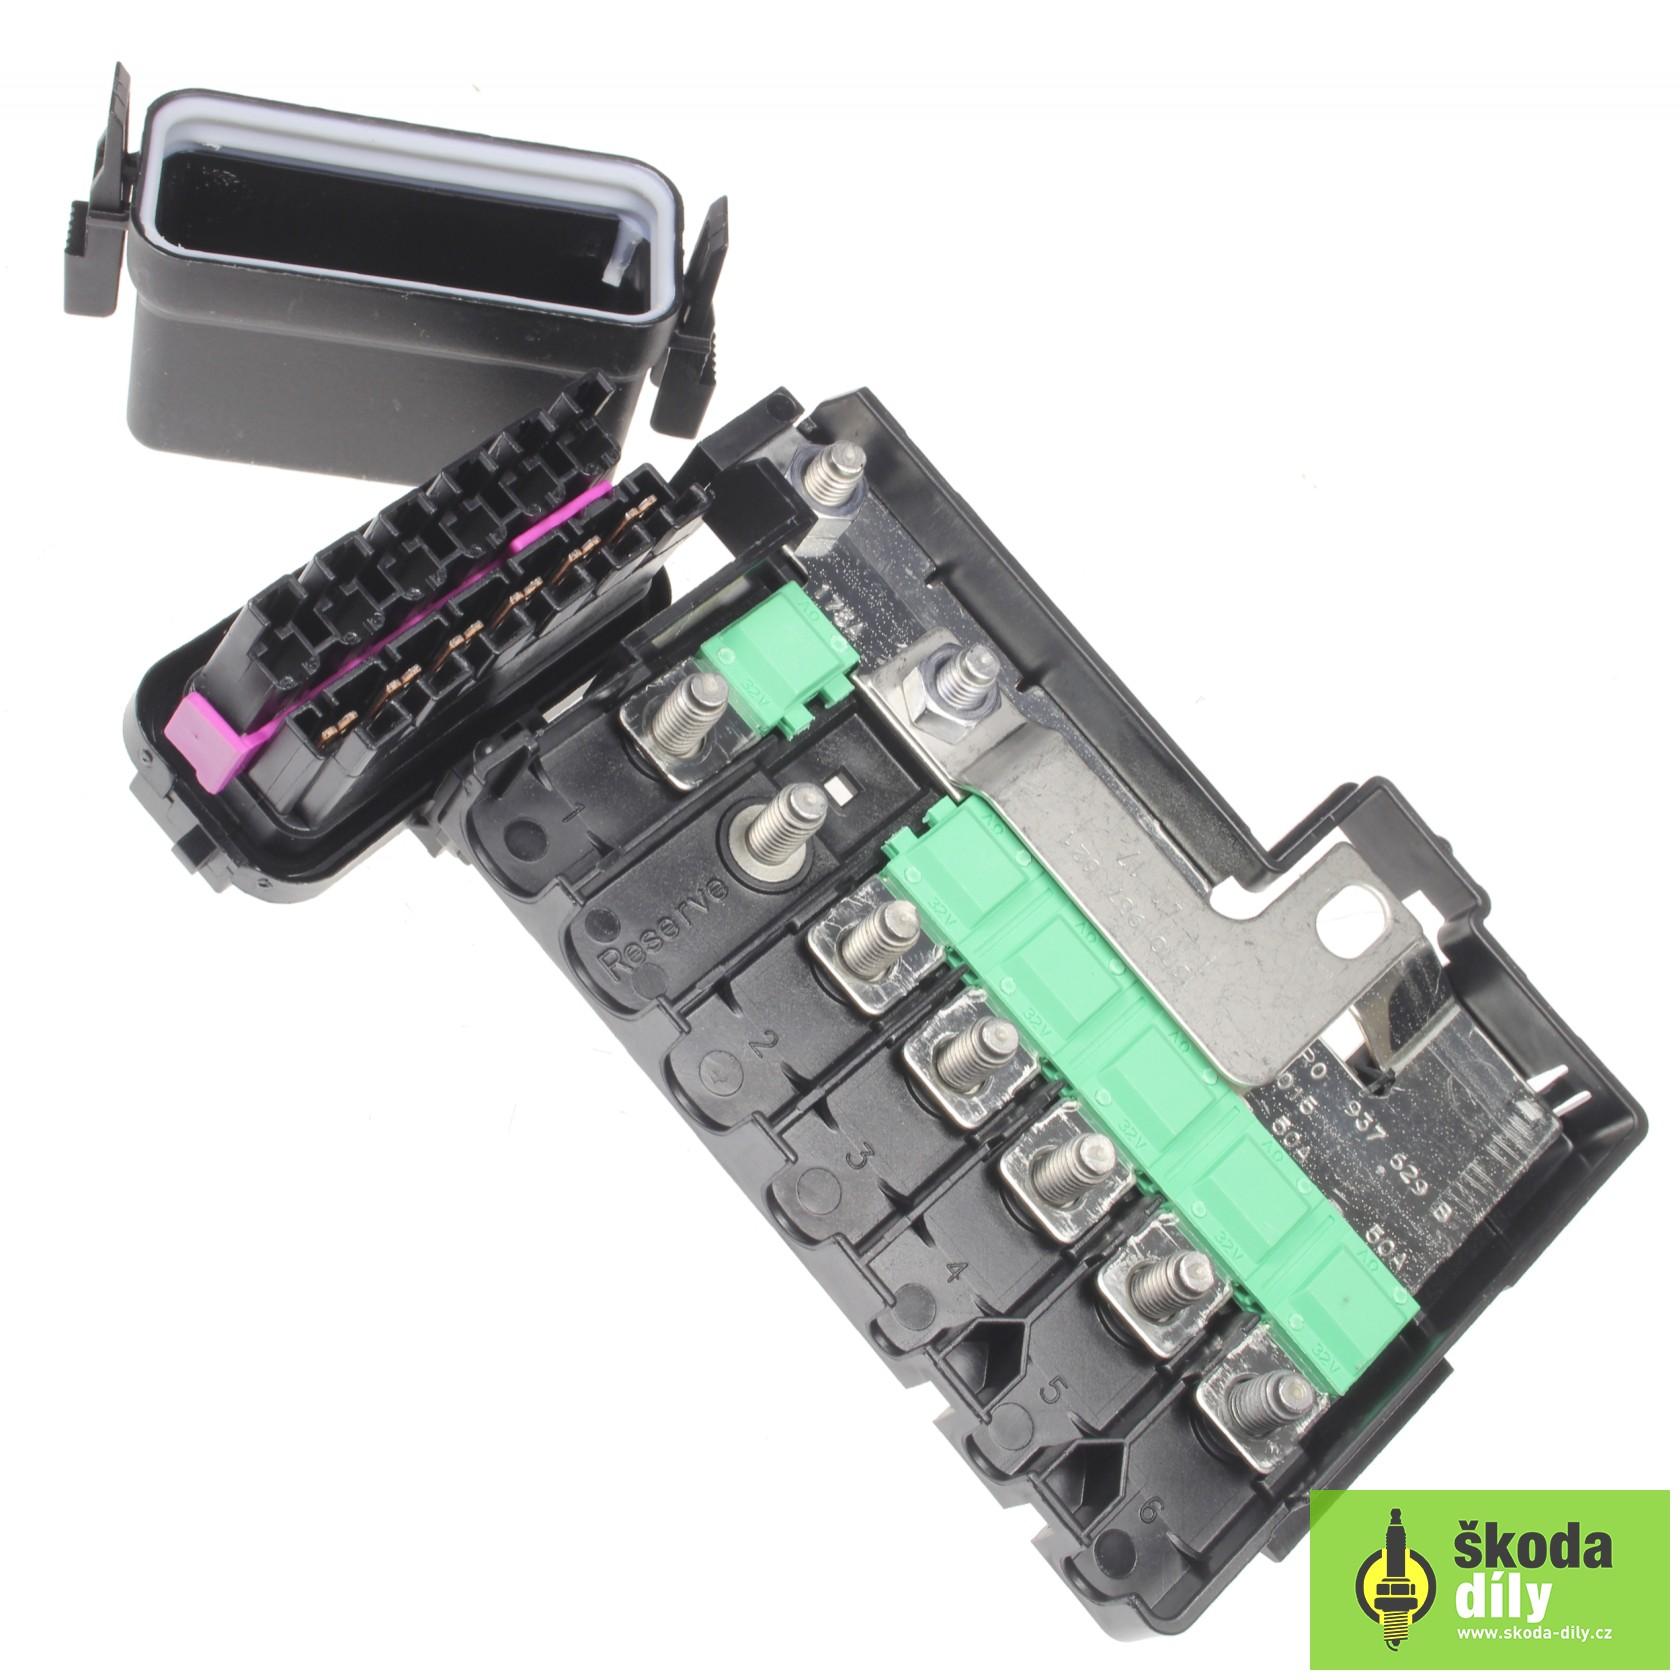 Fuse Box Škoda | Skoda-Parts.com